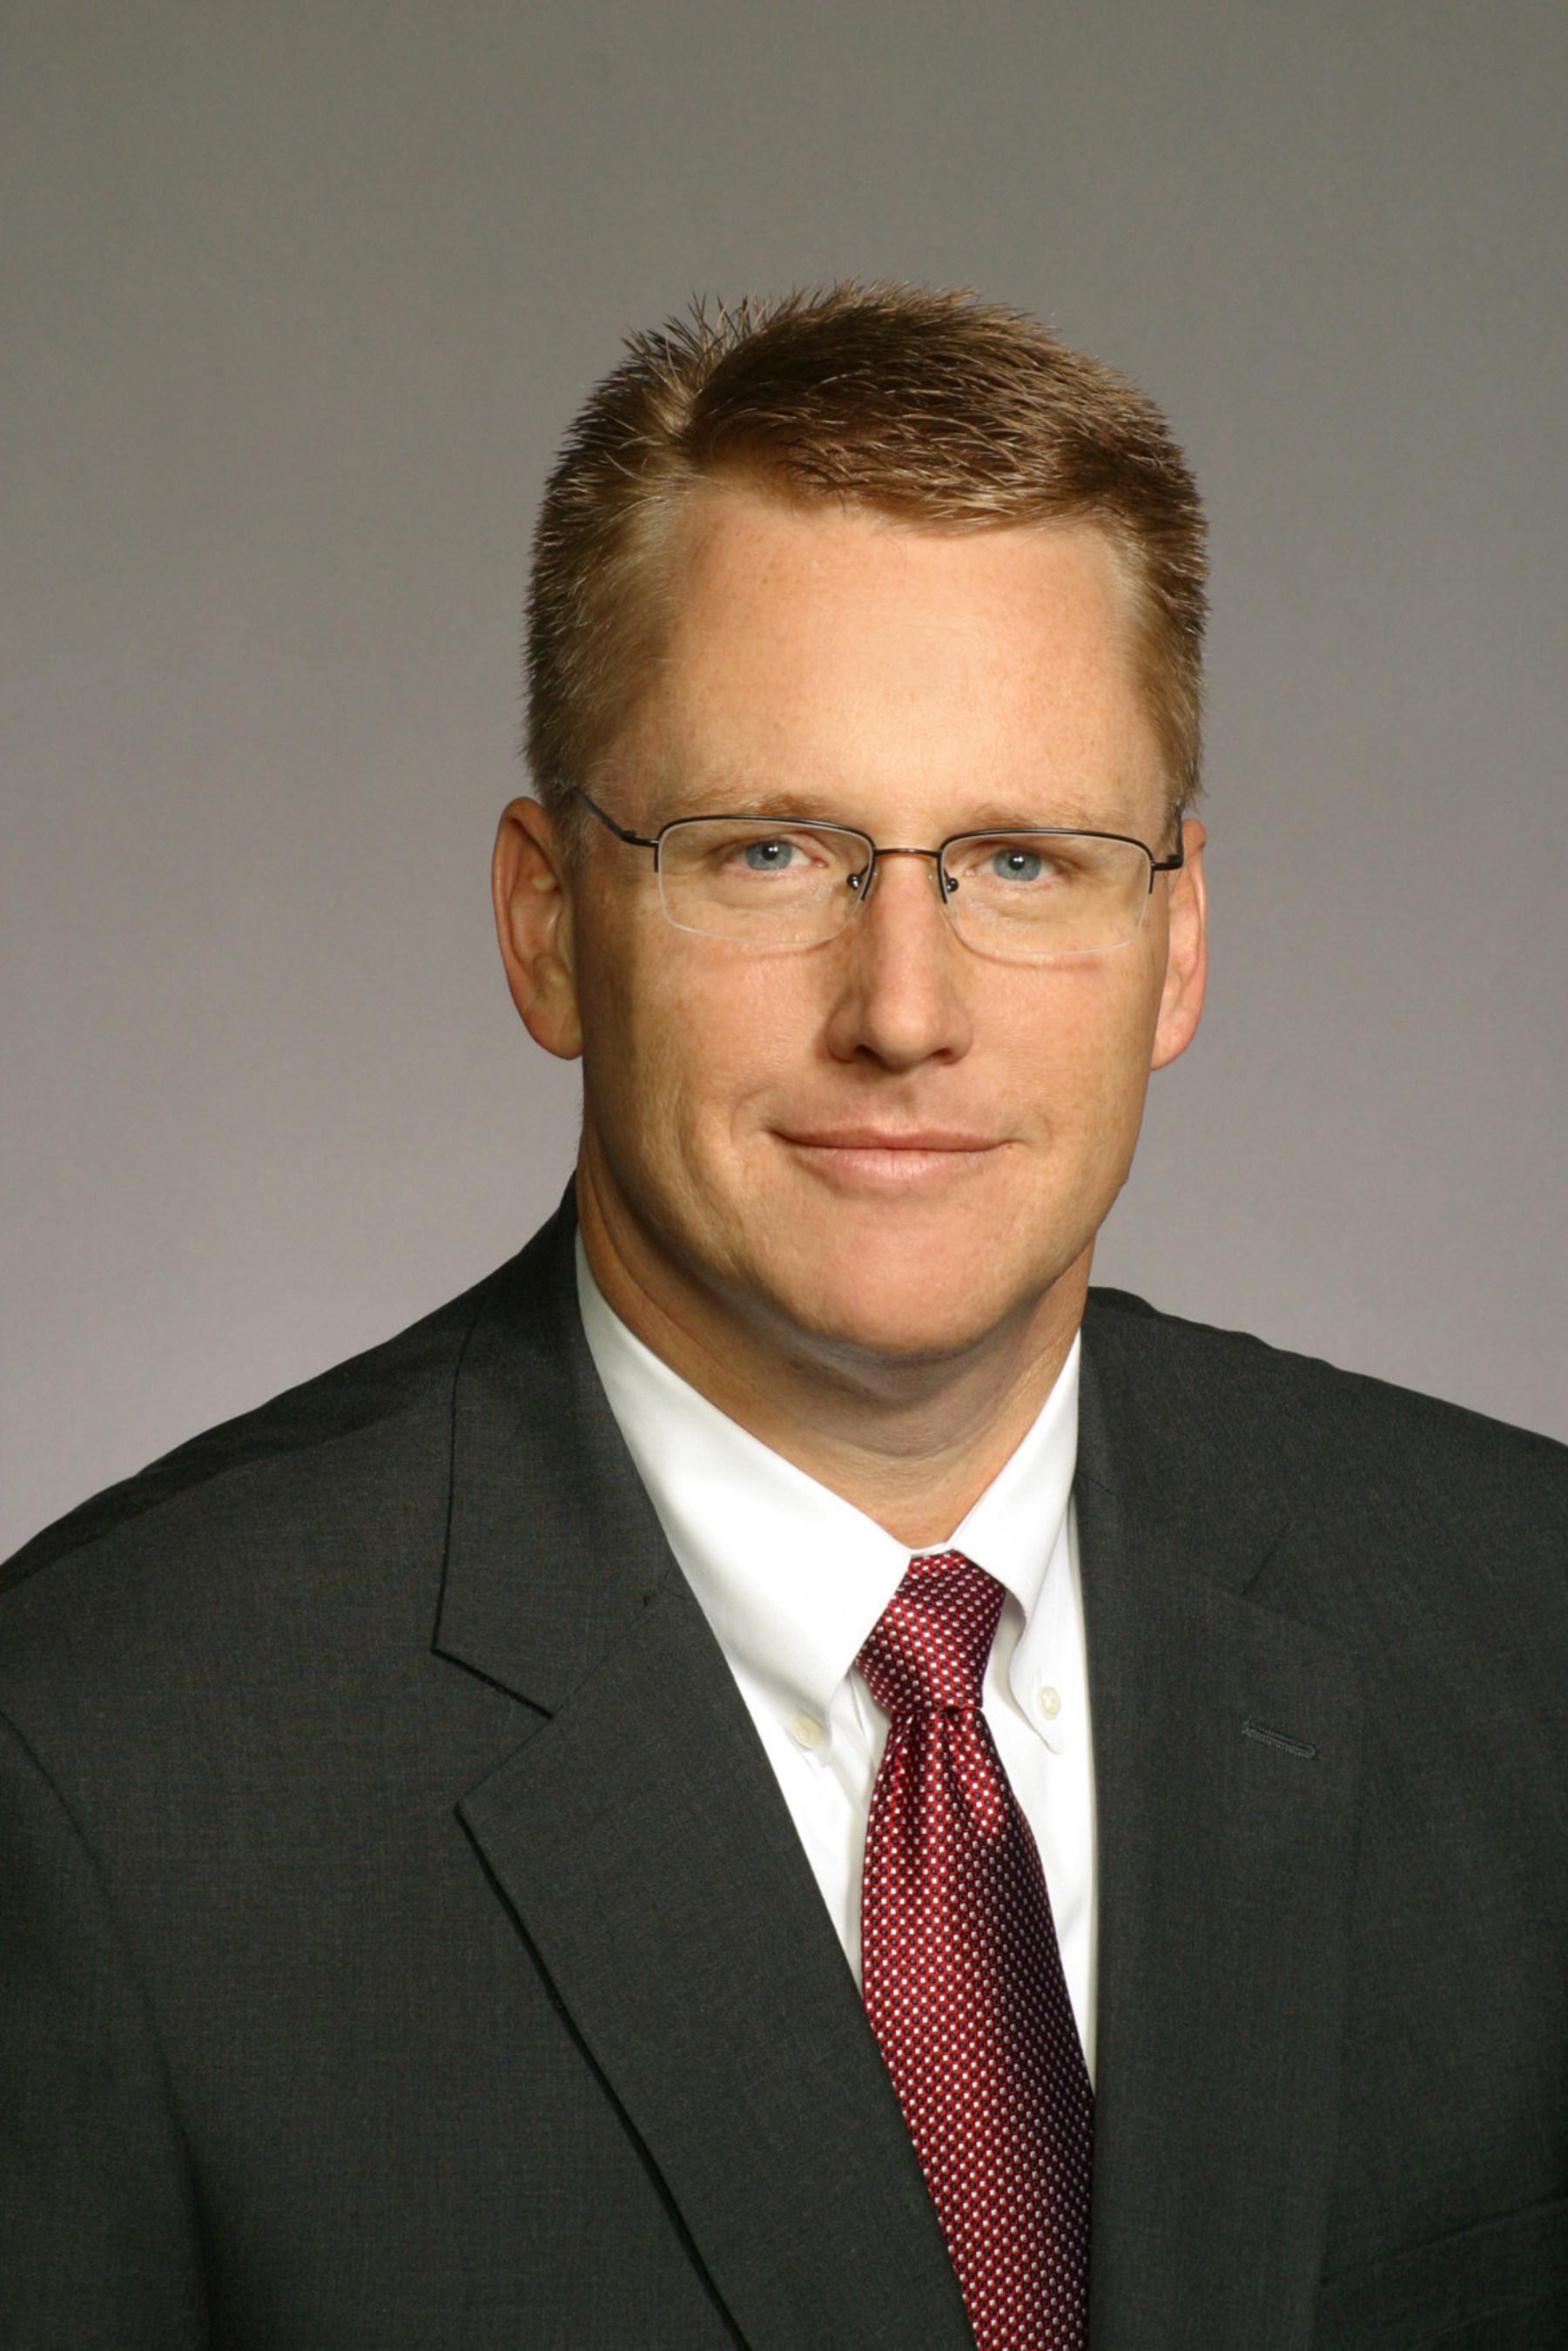 Cory J. Reed is appointed President, John Deere Financial, effective November 1.